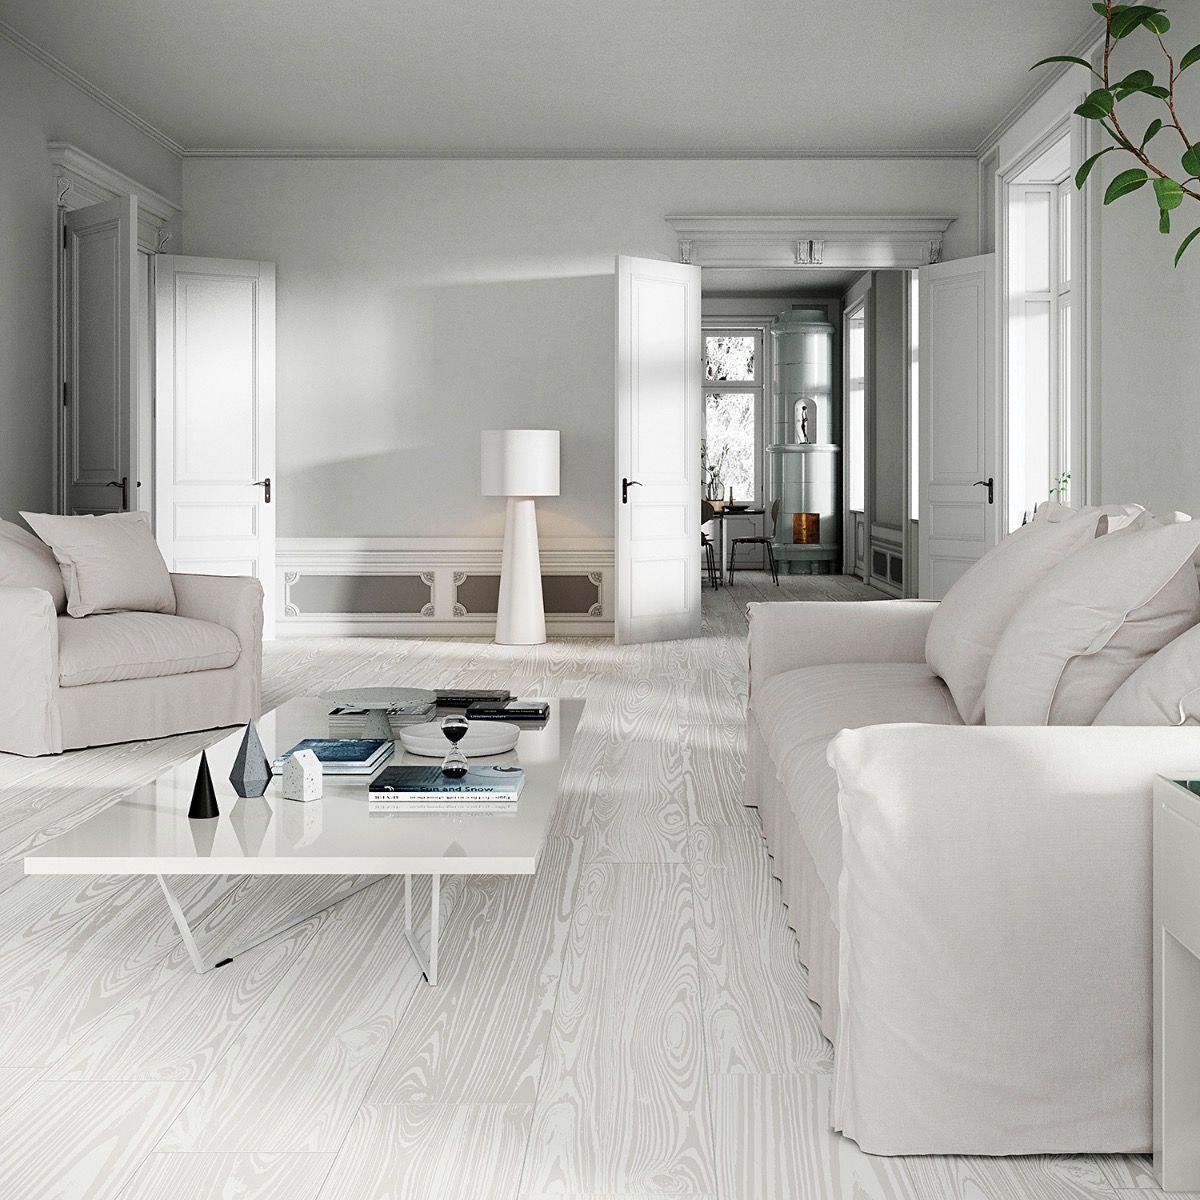 Artwood White 8x48 Matte Porcelain Tile Tile Floor Living Room Porcelain Flooring White Floors White floor living room